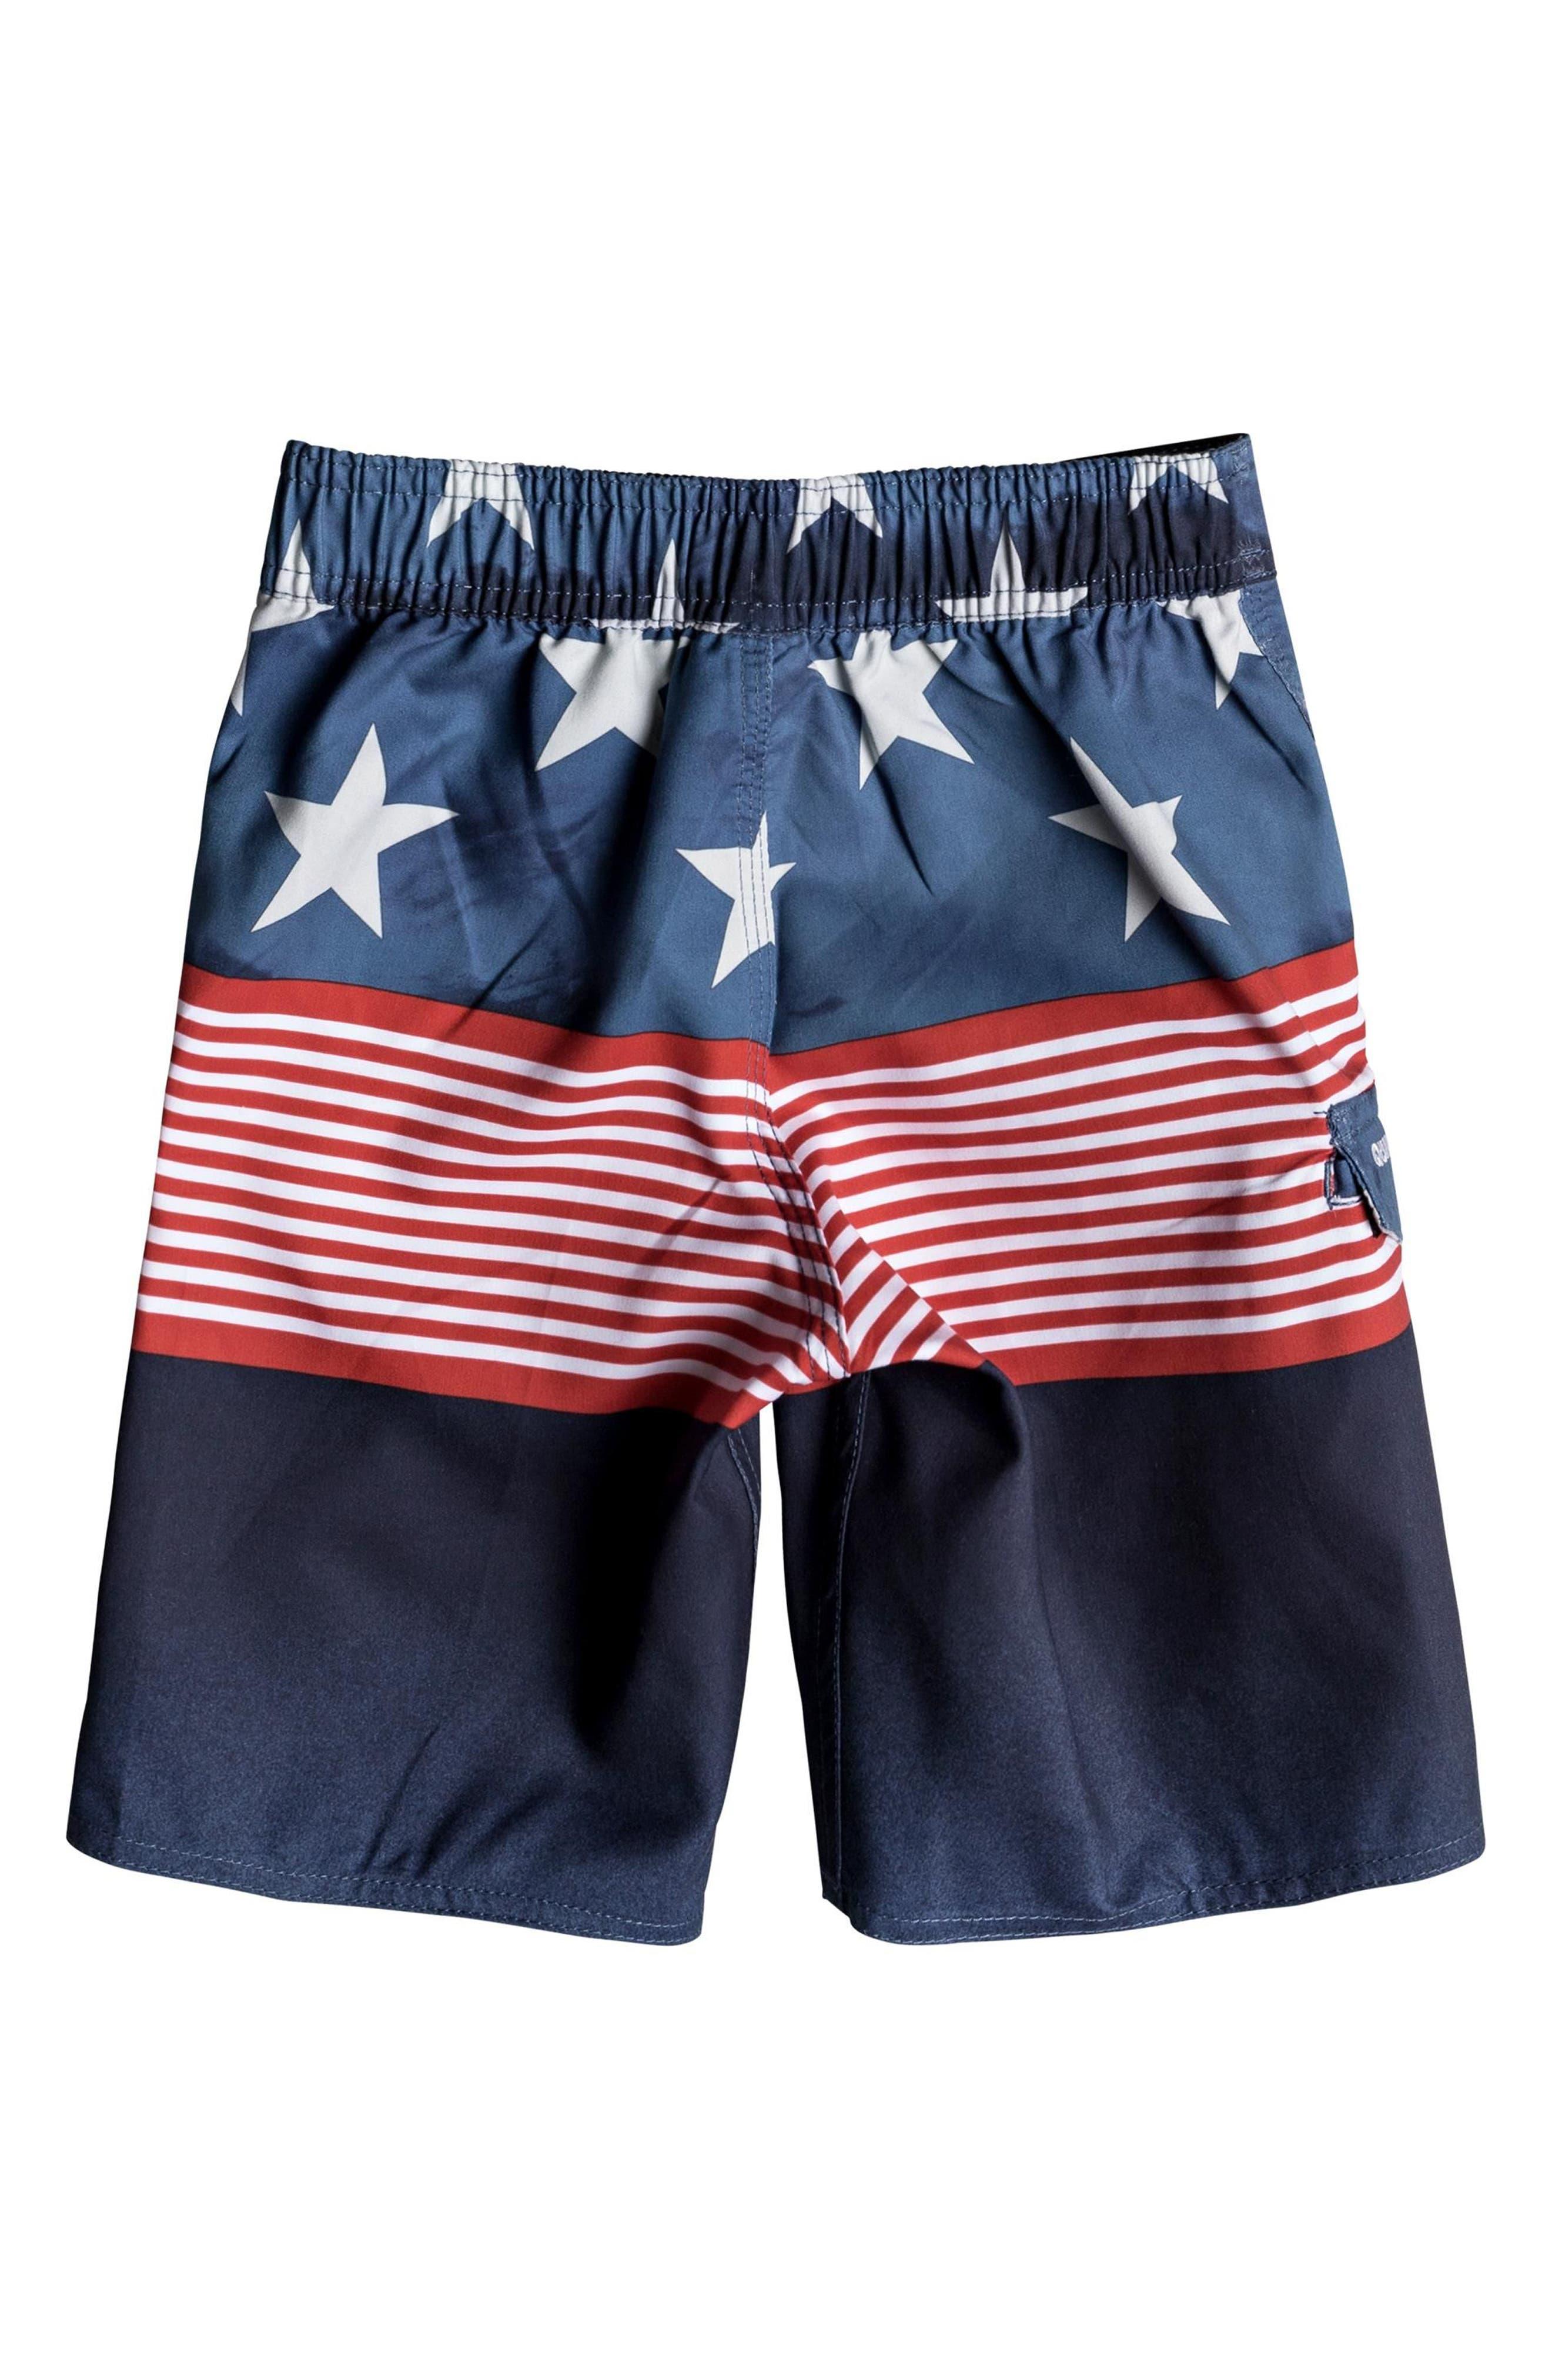 Division Independent Board Shorts,                             Alternate thumbnail 2, color,                             Navy Blazer